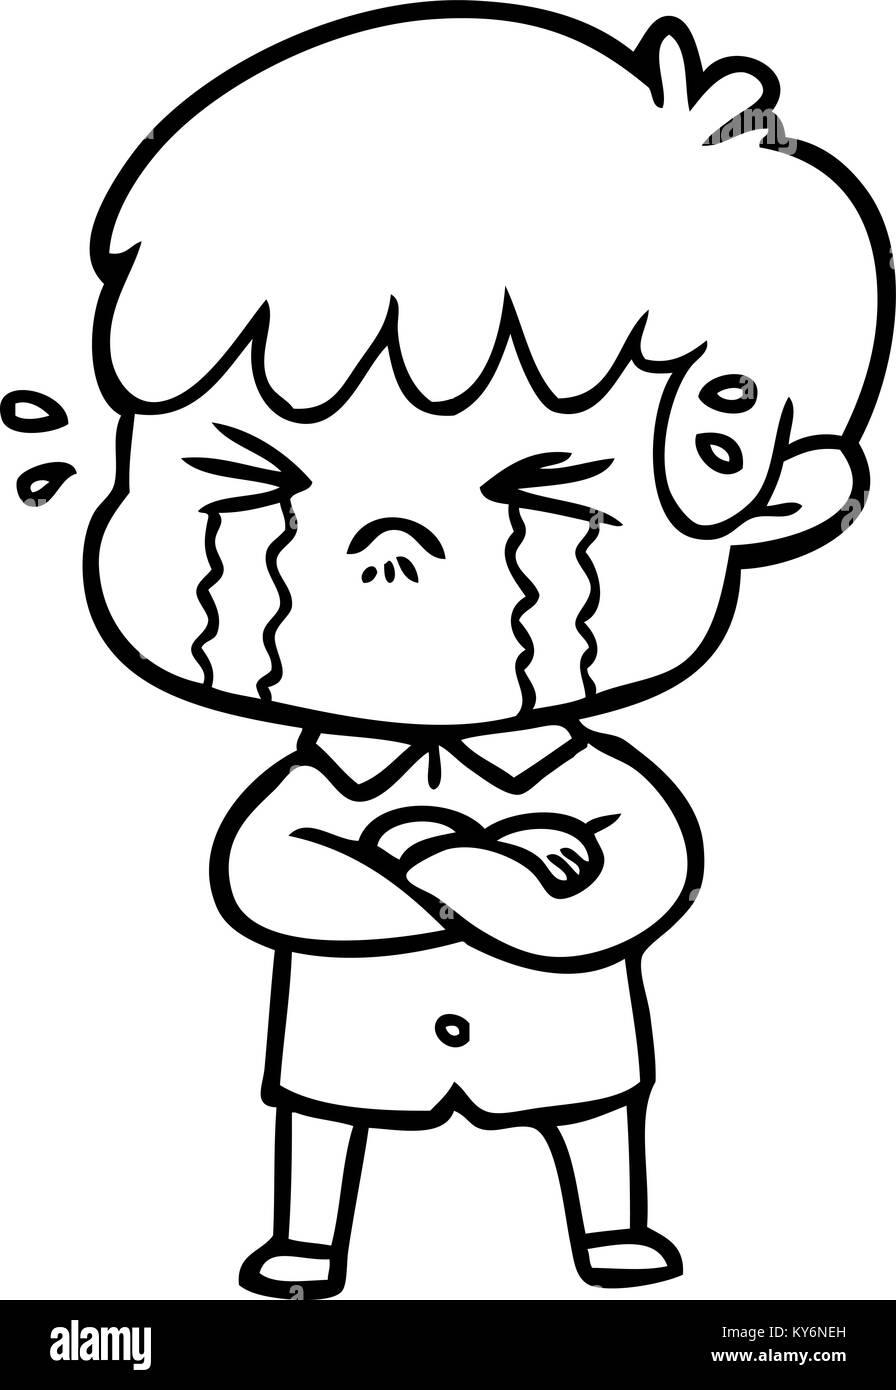 Crying boy cartoon stock image